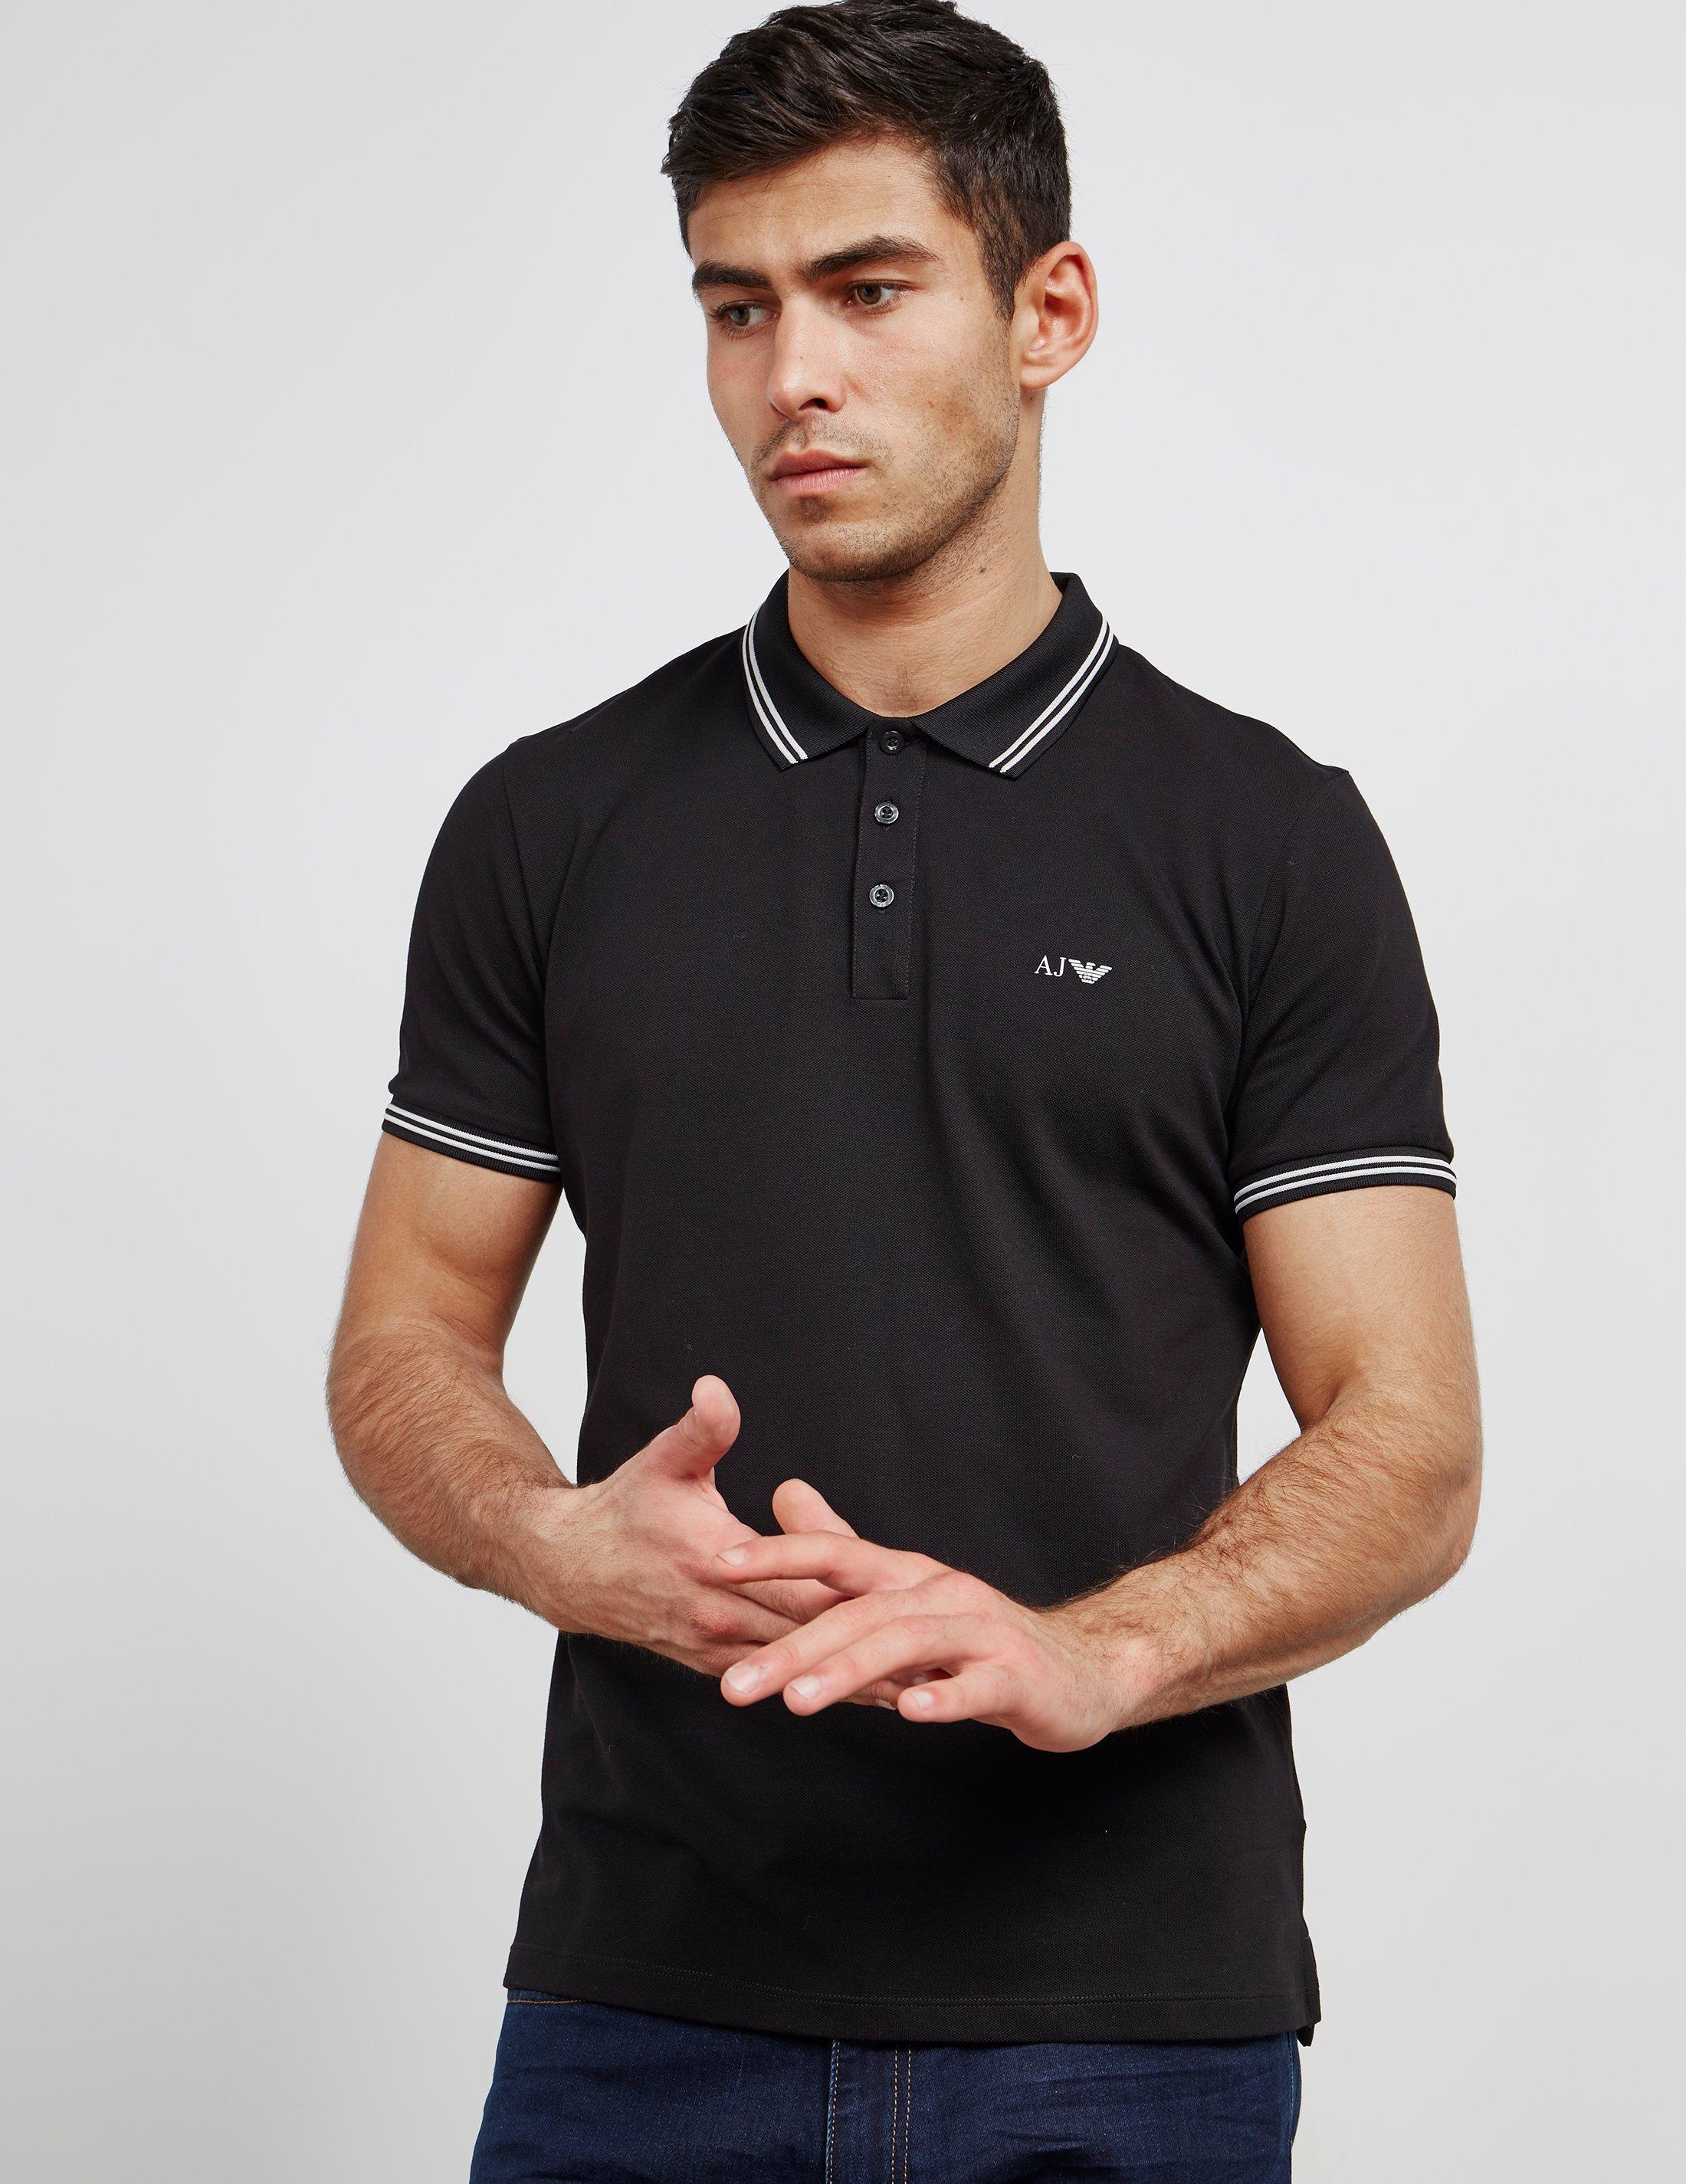 fb449dd5 Armani Jeans Mens Twin Tipped Short Sleeve Polo Shirt Black in Black ...